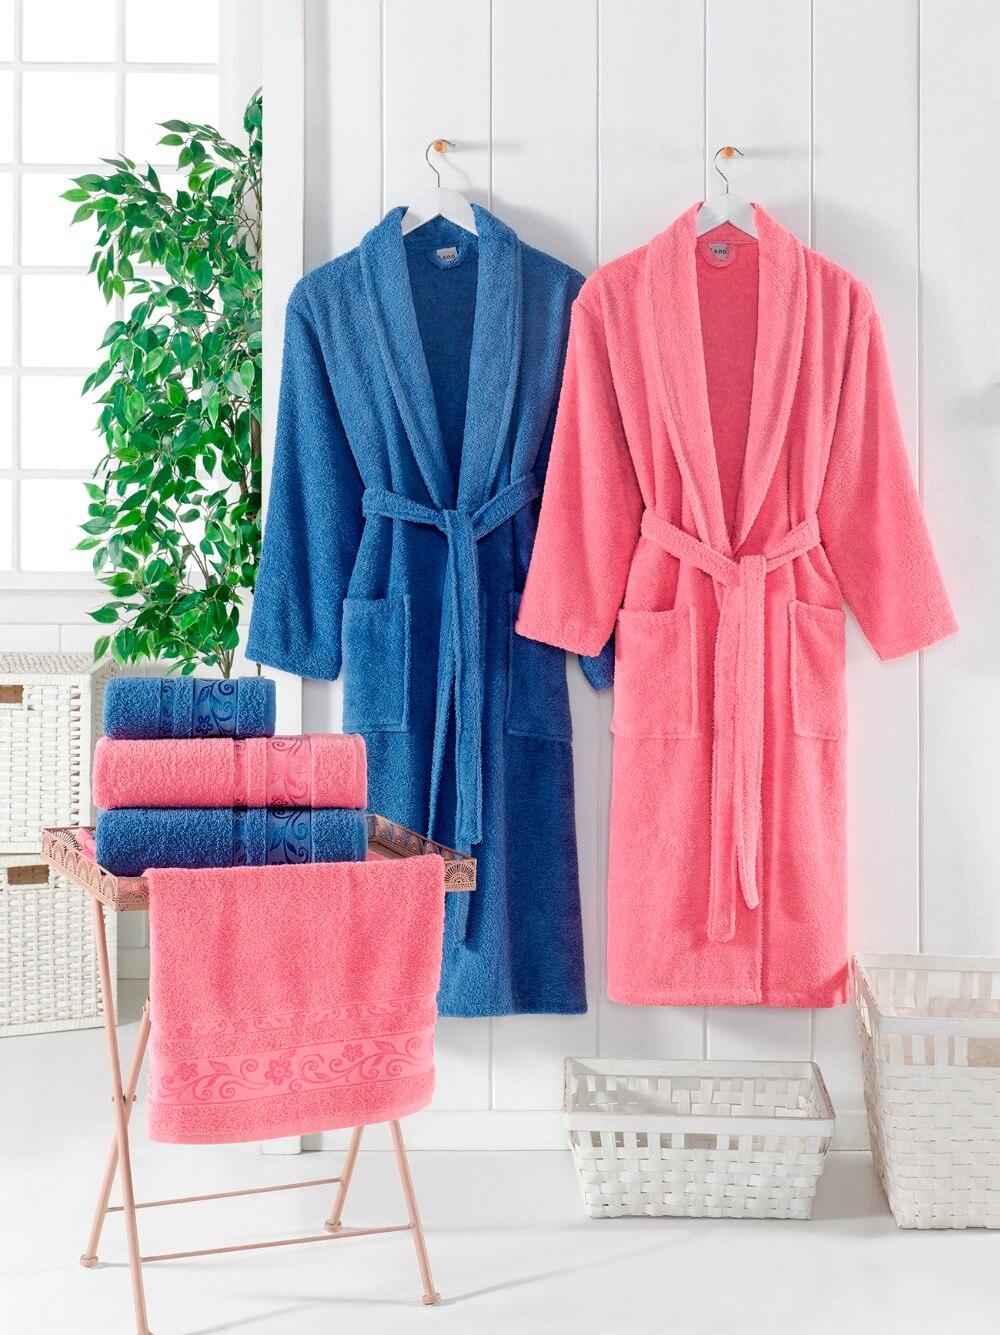 MicroCotton Bathrobe Family Set 6 pcs Men's Bathrobes Women's Bathrobes Extra Long Premium Cotton Bathrobe Bath Towel Hand Towel